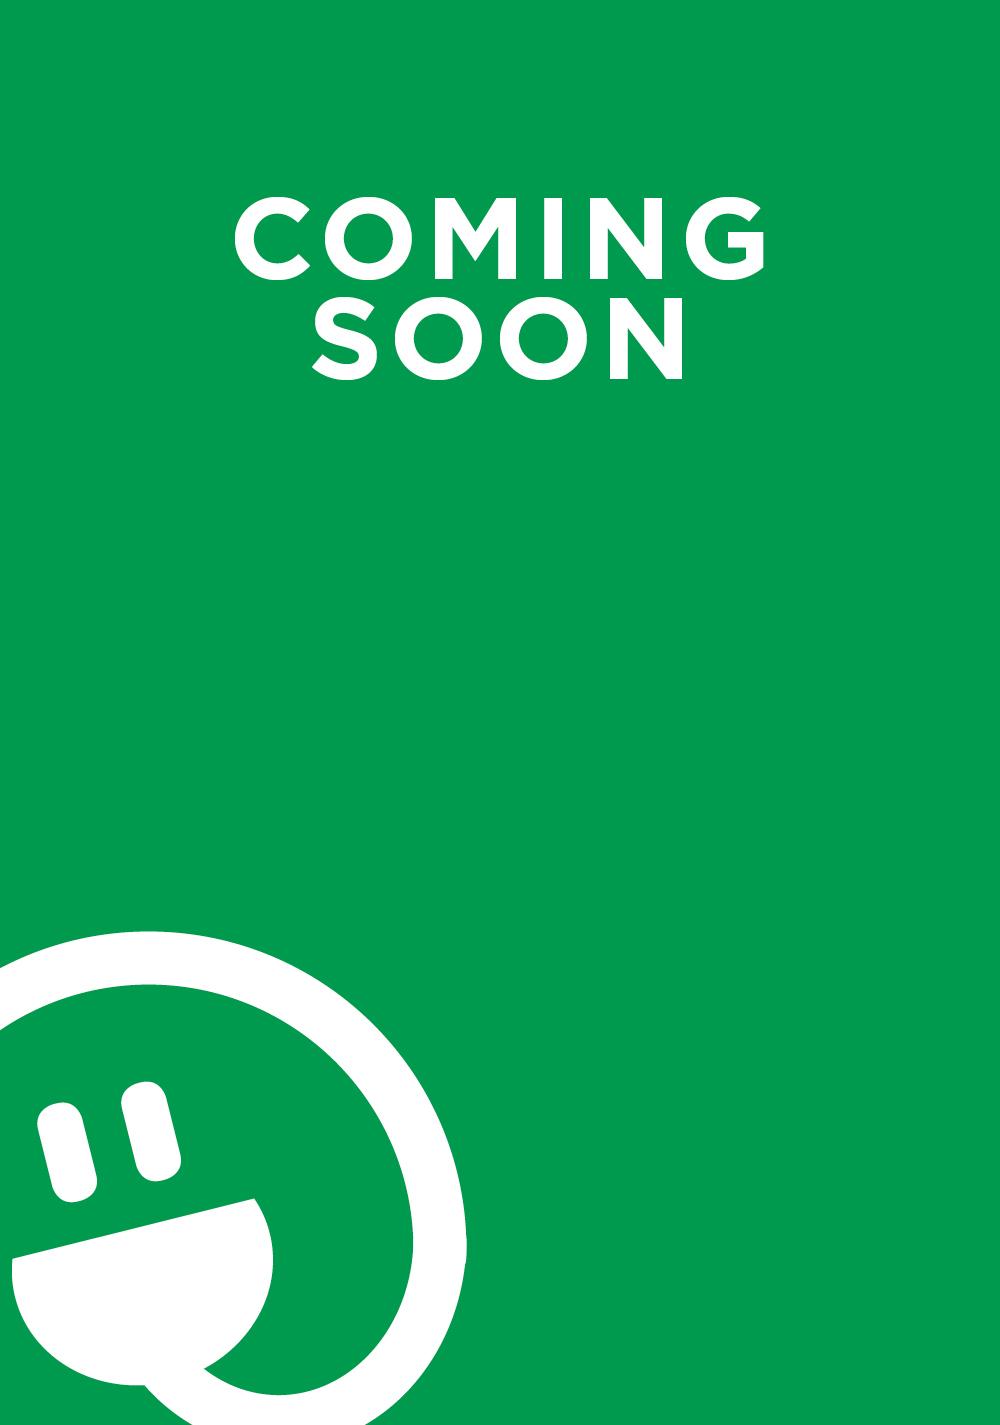 Coming soon scheda tecnica